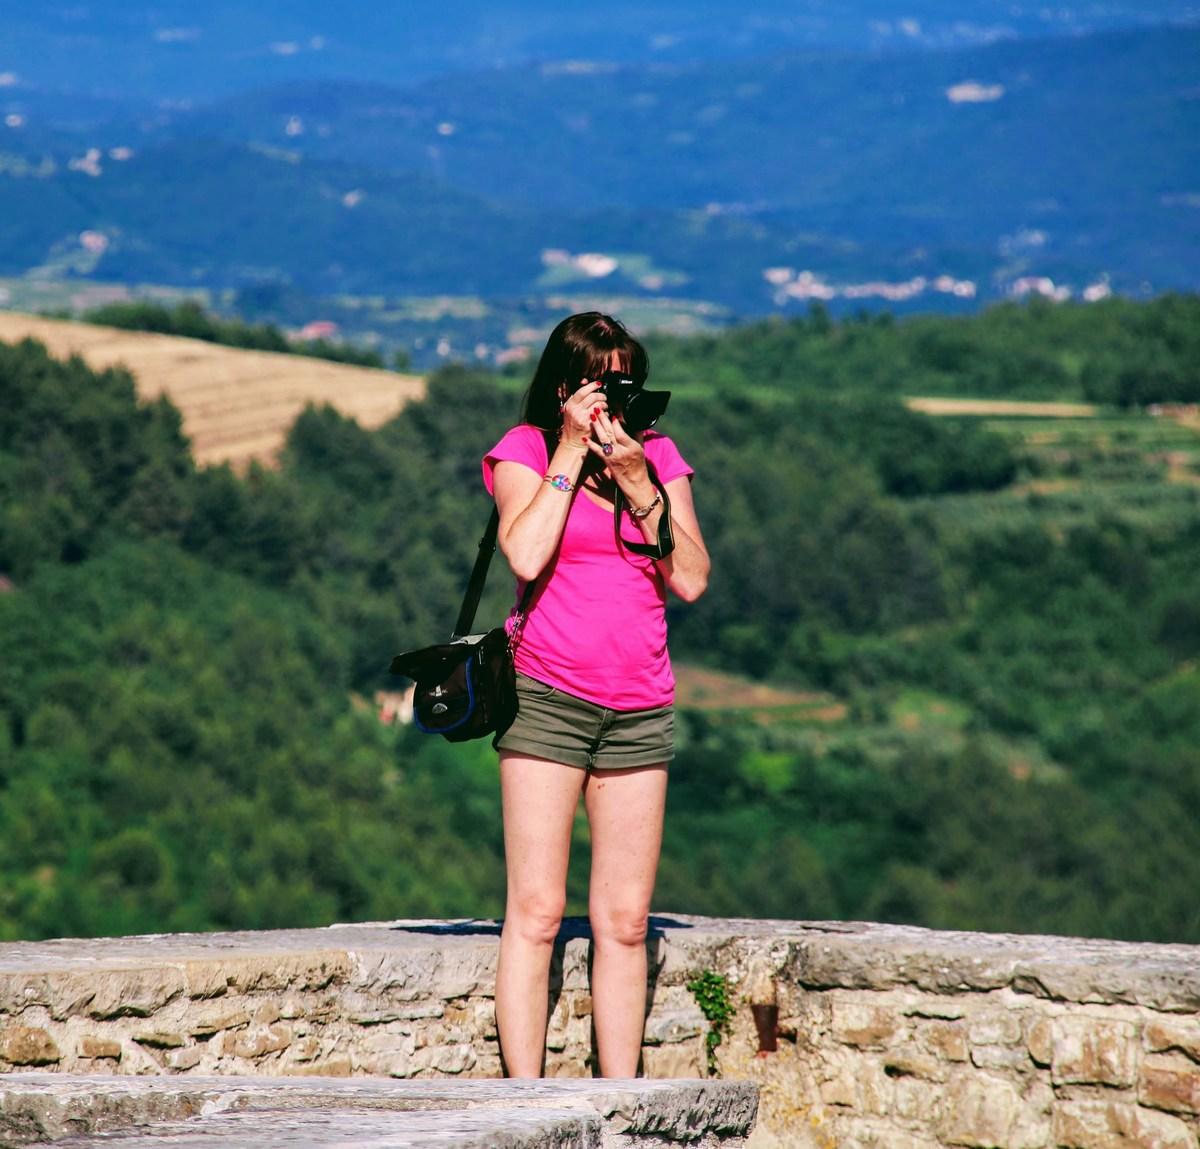 Turistka fotografinja